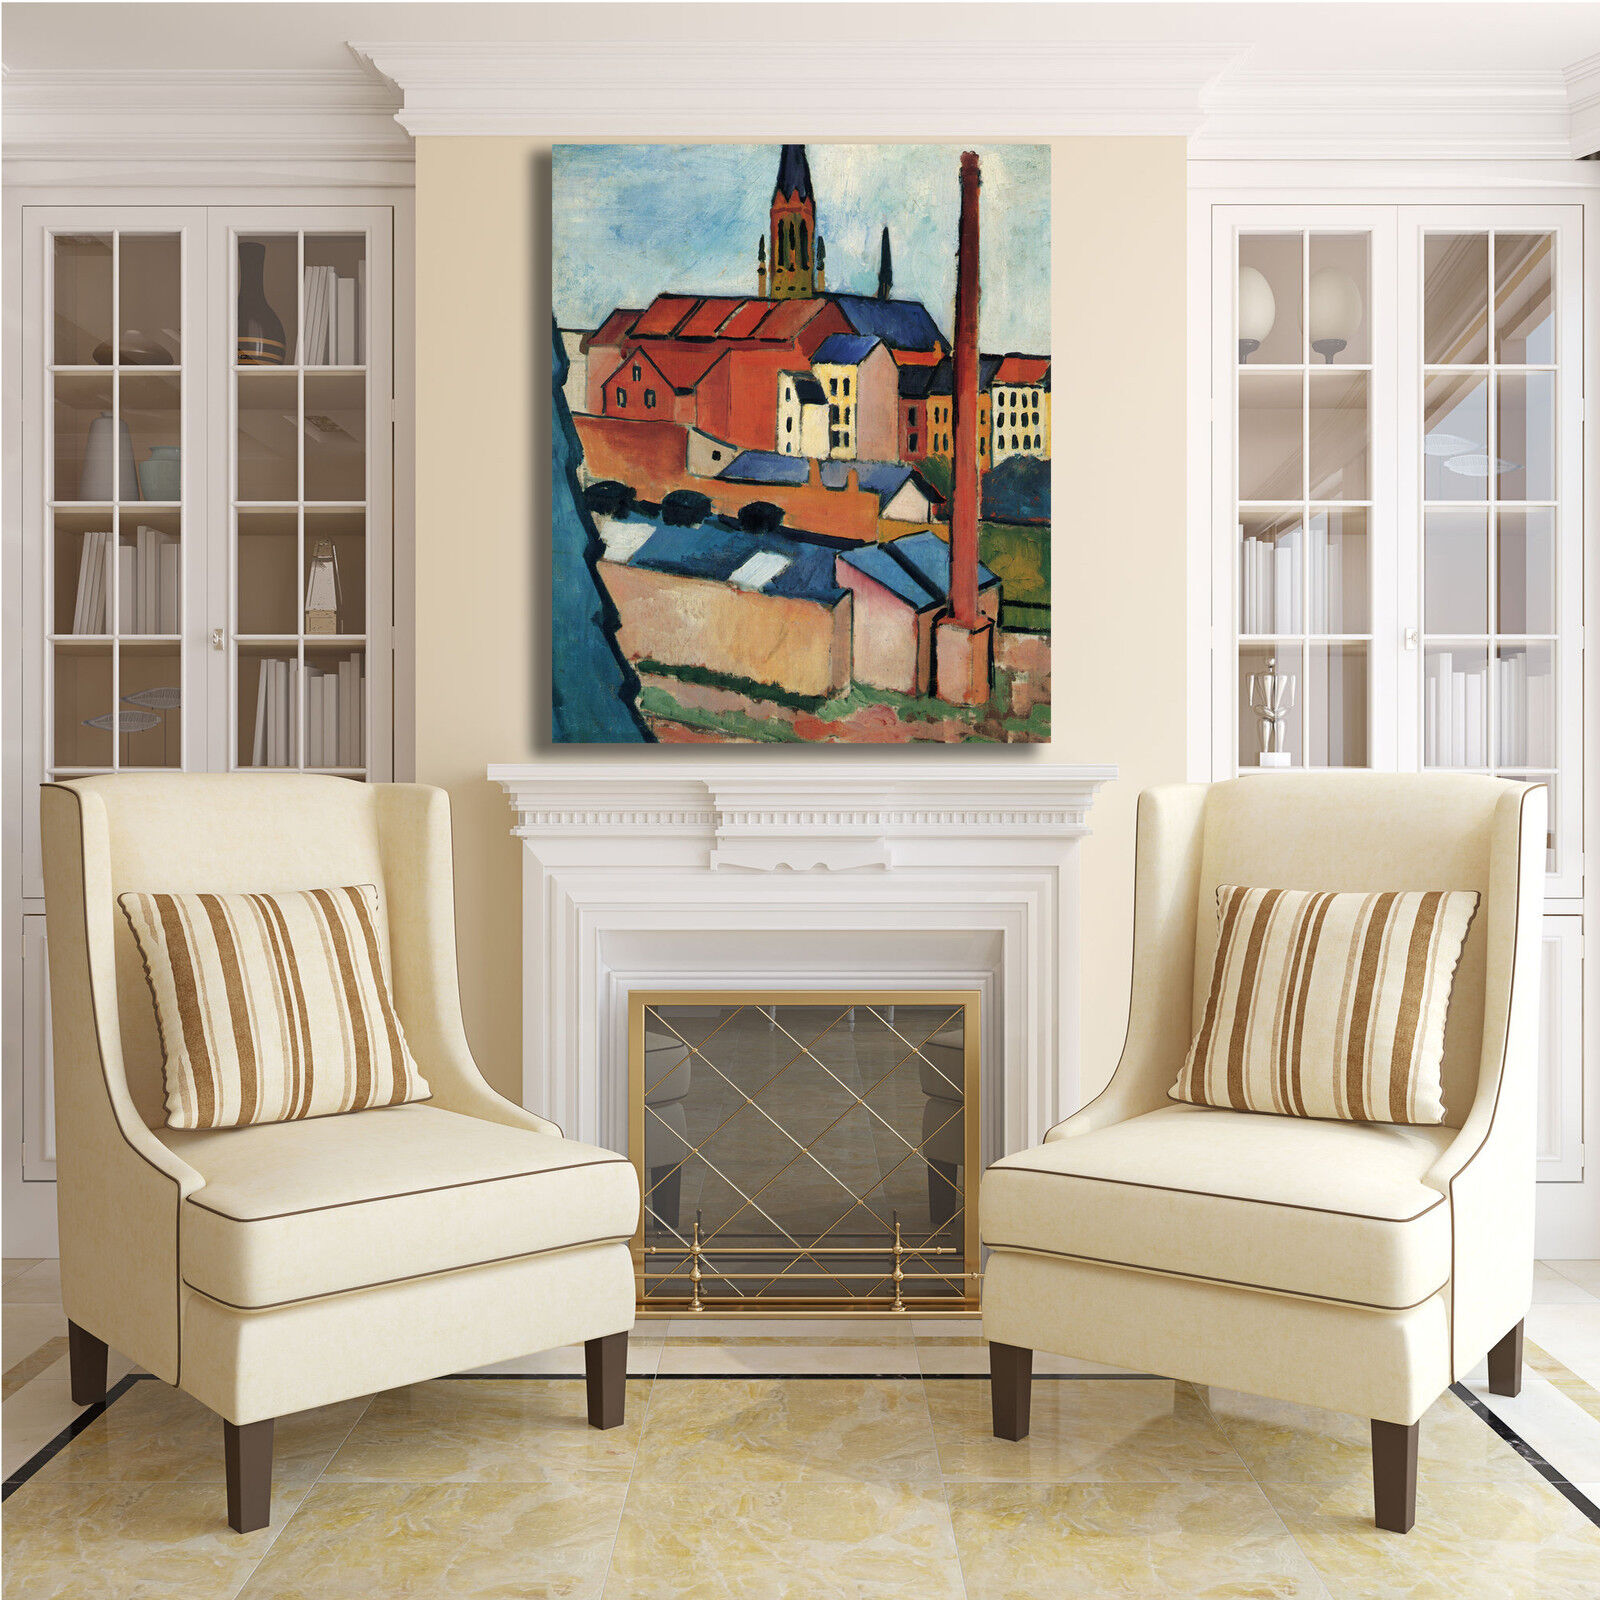 Macke case con un camino quadro design quadro camino stampa tela dipinto telaio arRouge o casa ca6d3c